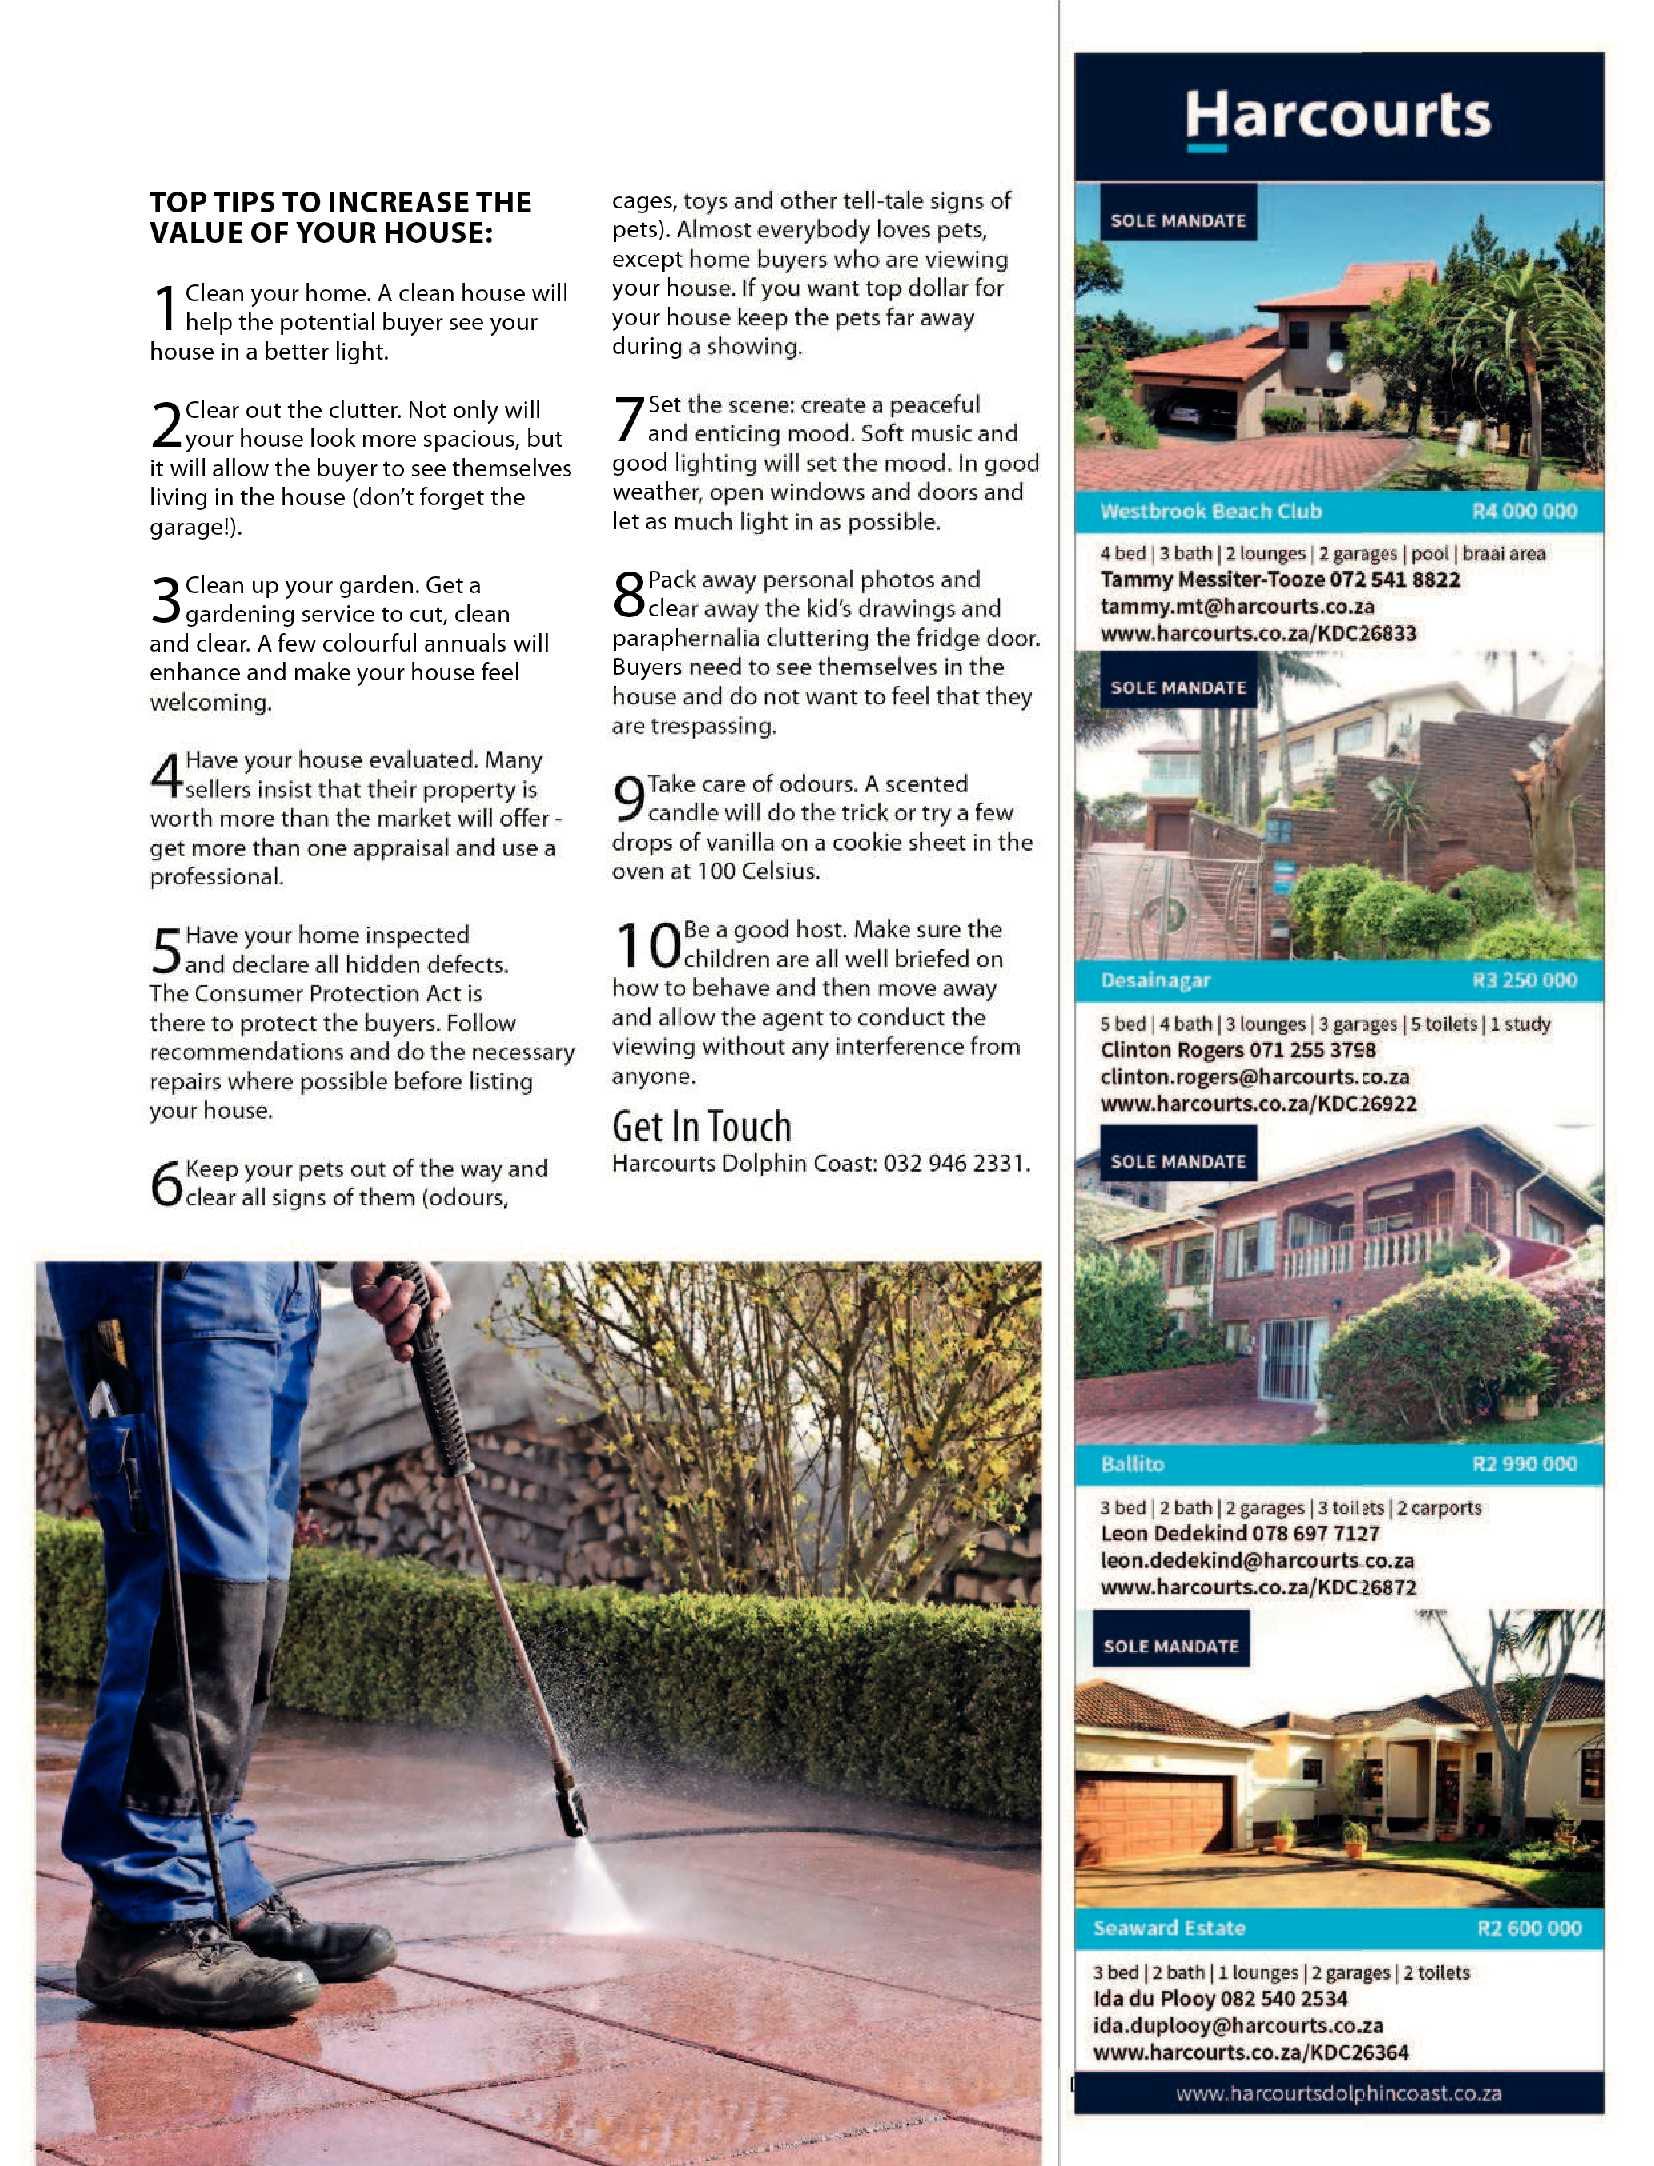 get-magazine-ballitoumhlanga-december-2016-january-2017-epapers-page-95